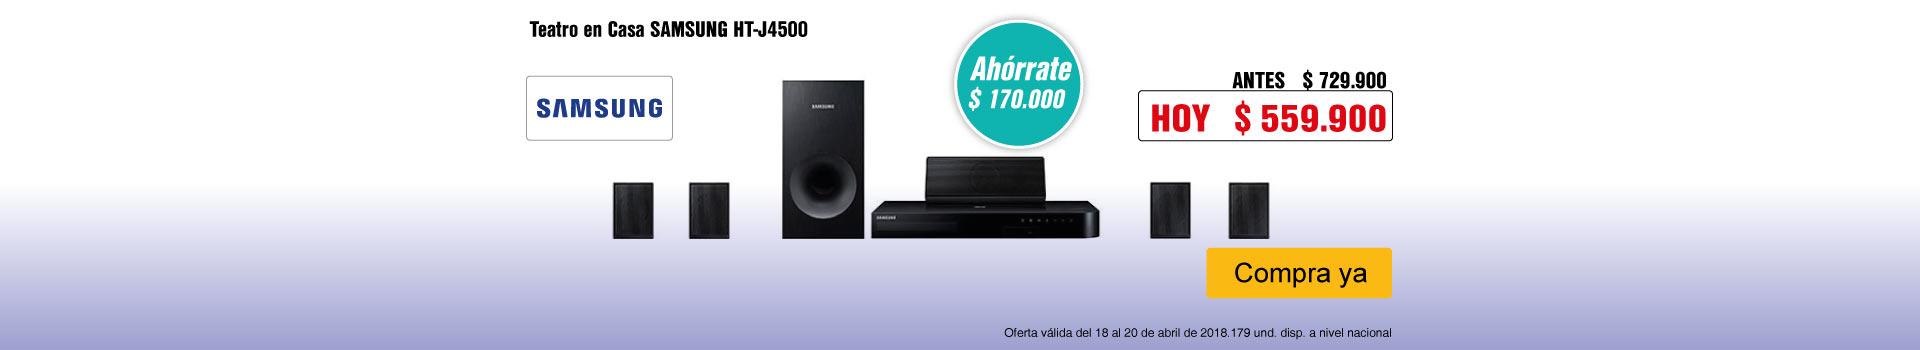 AK-KT-BCAT-1-audio-PP---Samsung-HT-J4500-Abr18